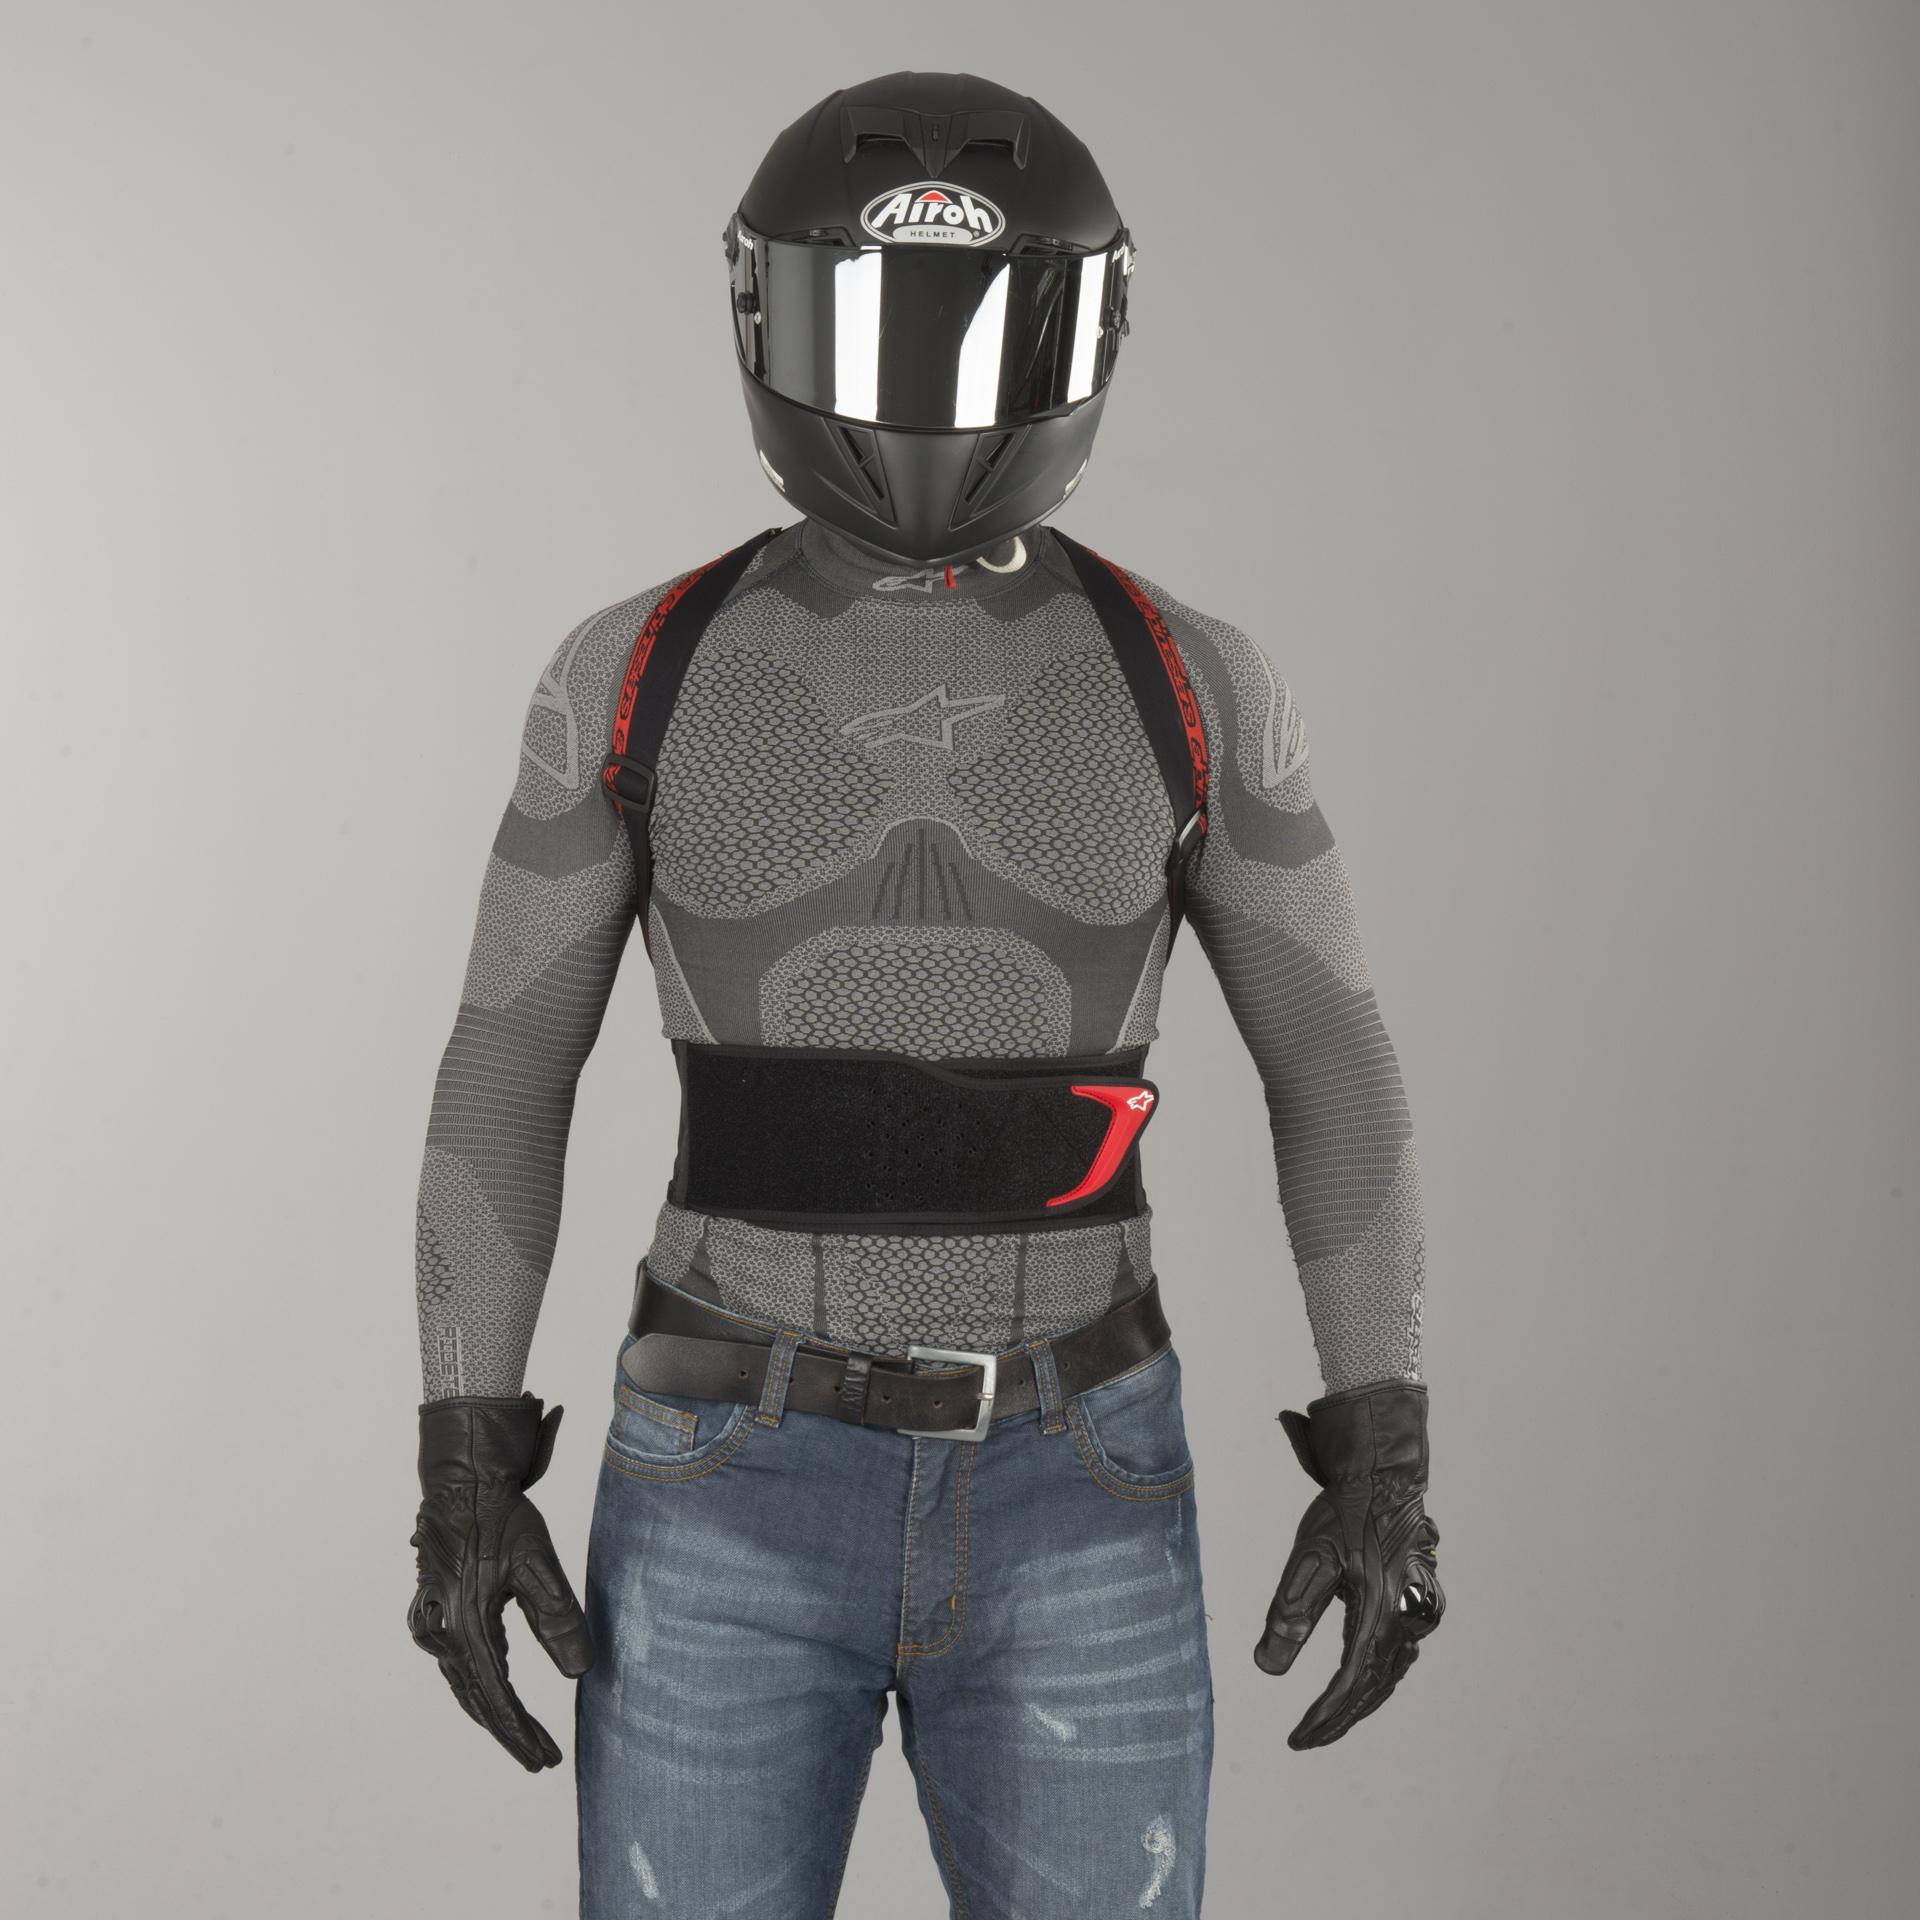 Protector de Espalda Alpinestars Nucleon KR-1 Negro//Ahumado//Rojo XL